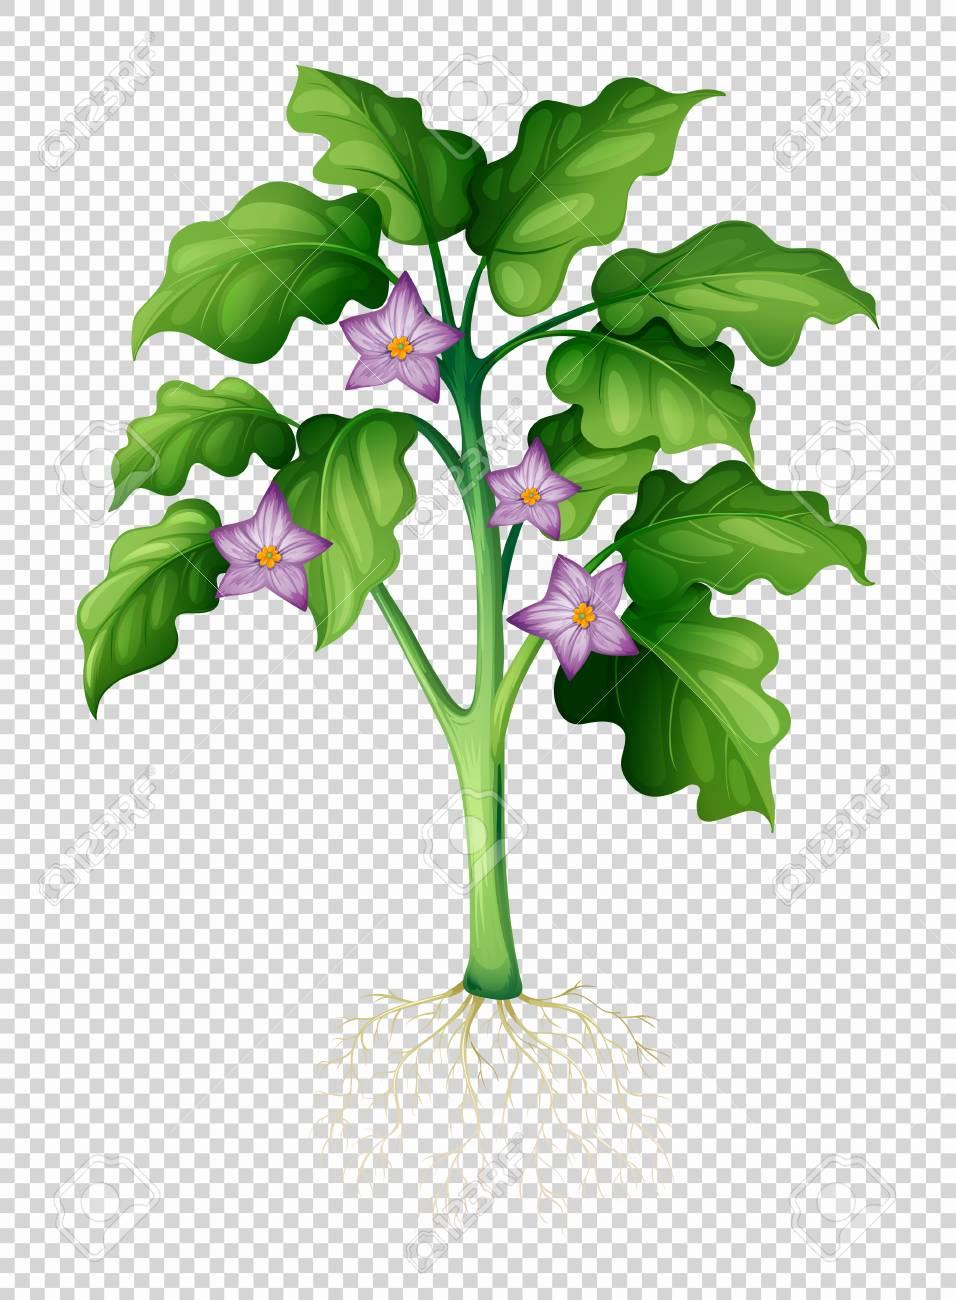 Eggplant Tree On Transparent Background Illustration Royalty Free